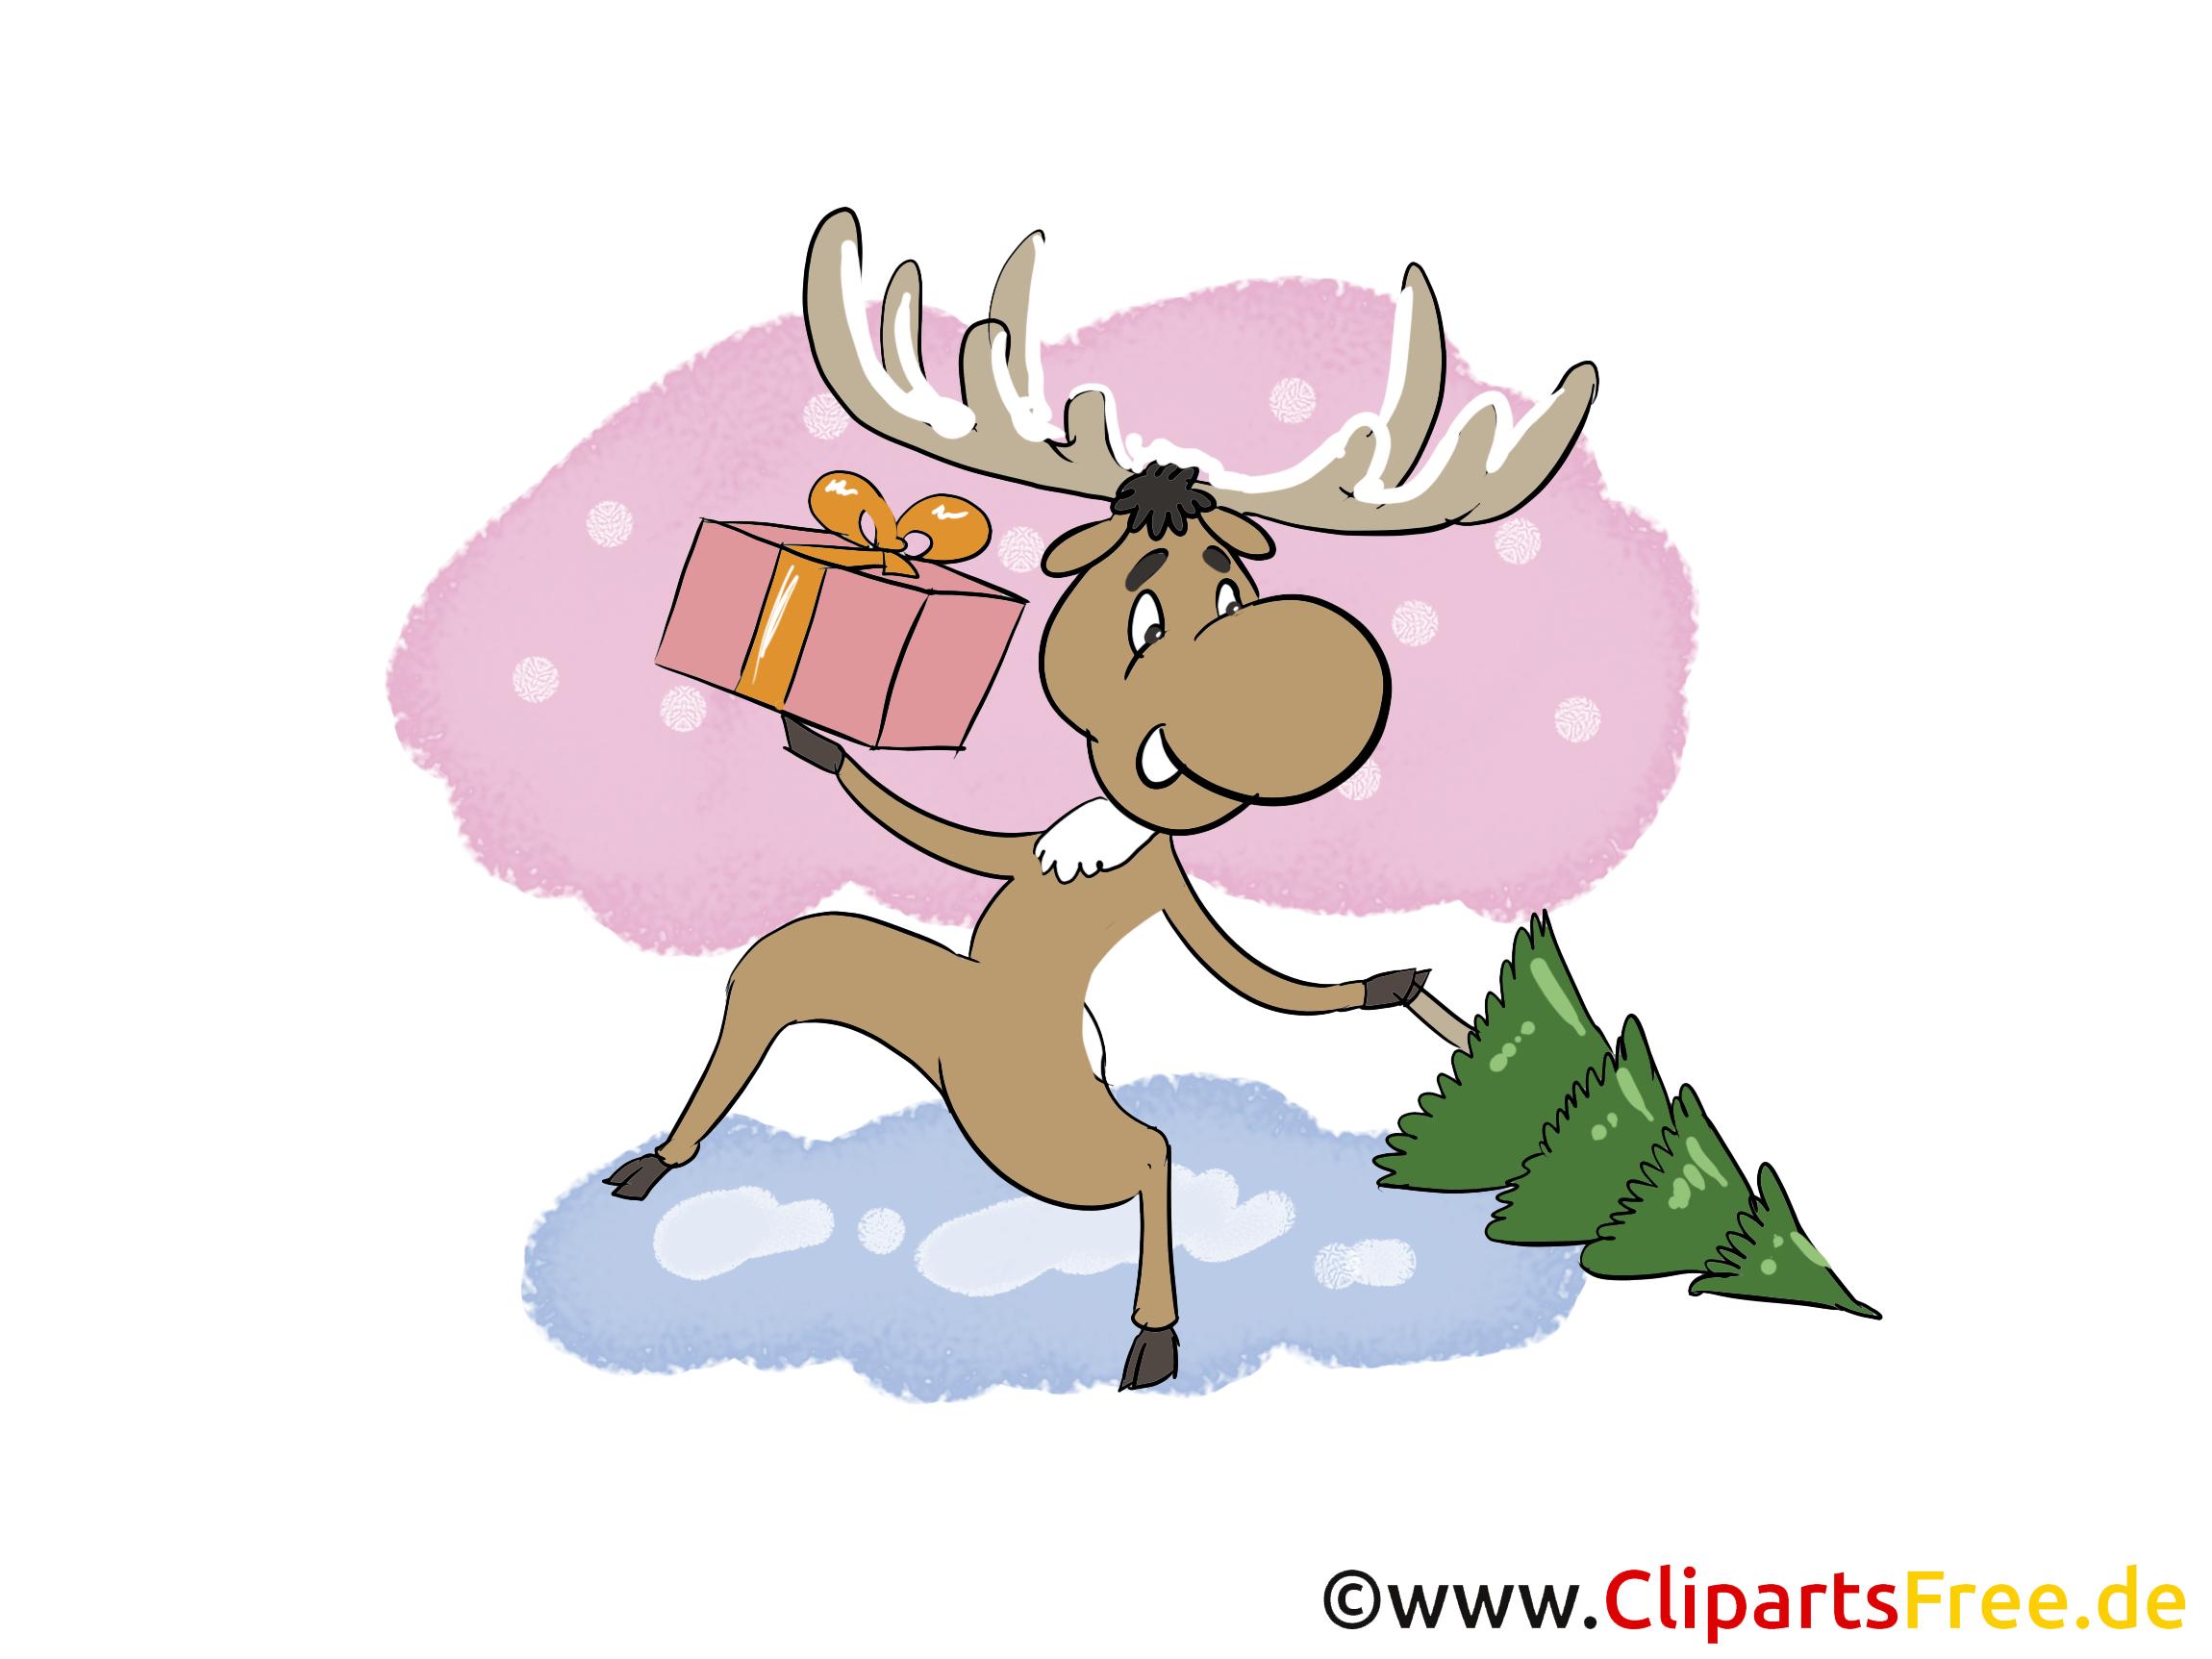 Elch vom Santa Claus Bild, Clip Art, Image, Cartoon gratis